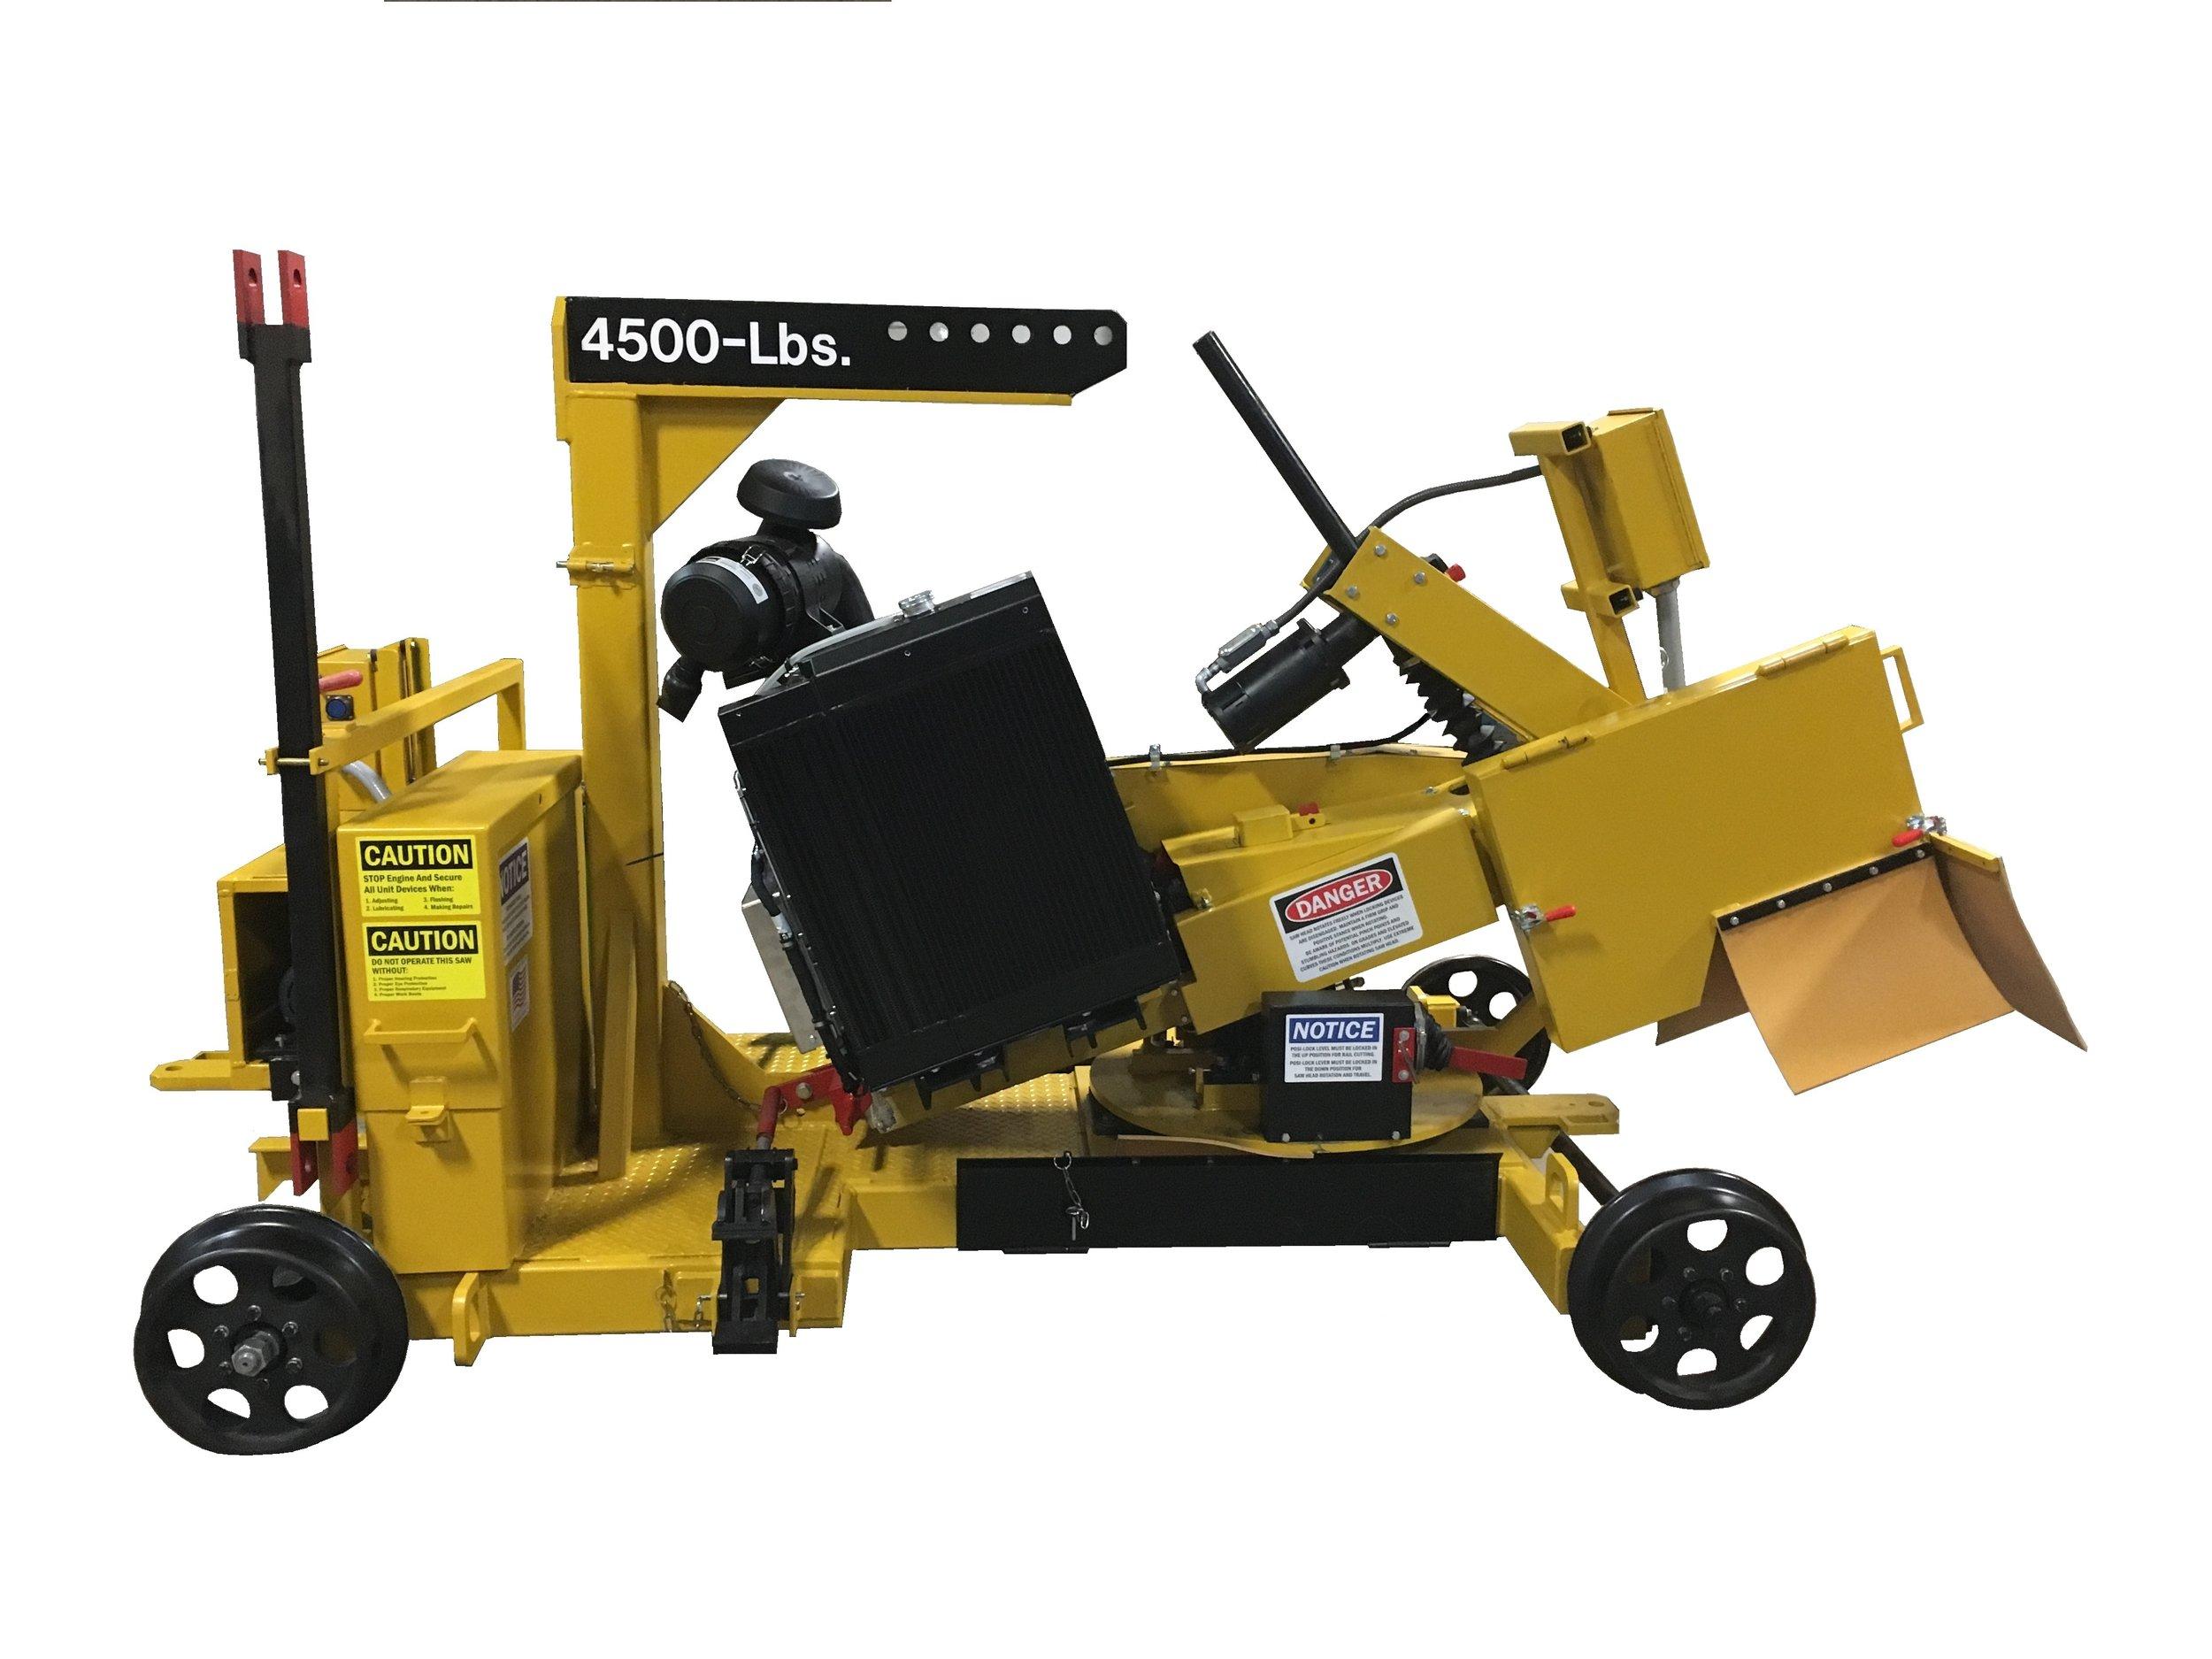 Production Rail Saw -